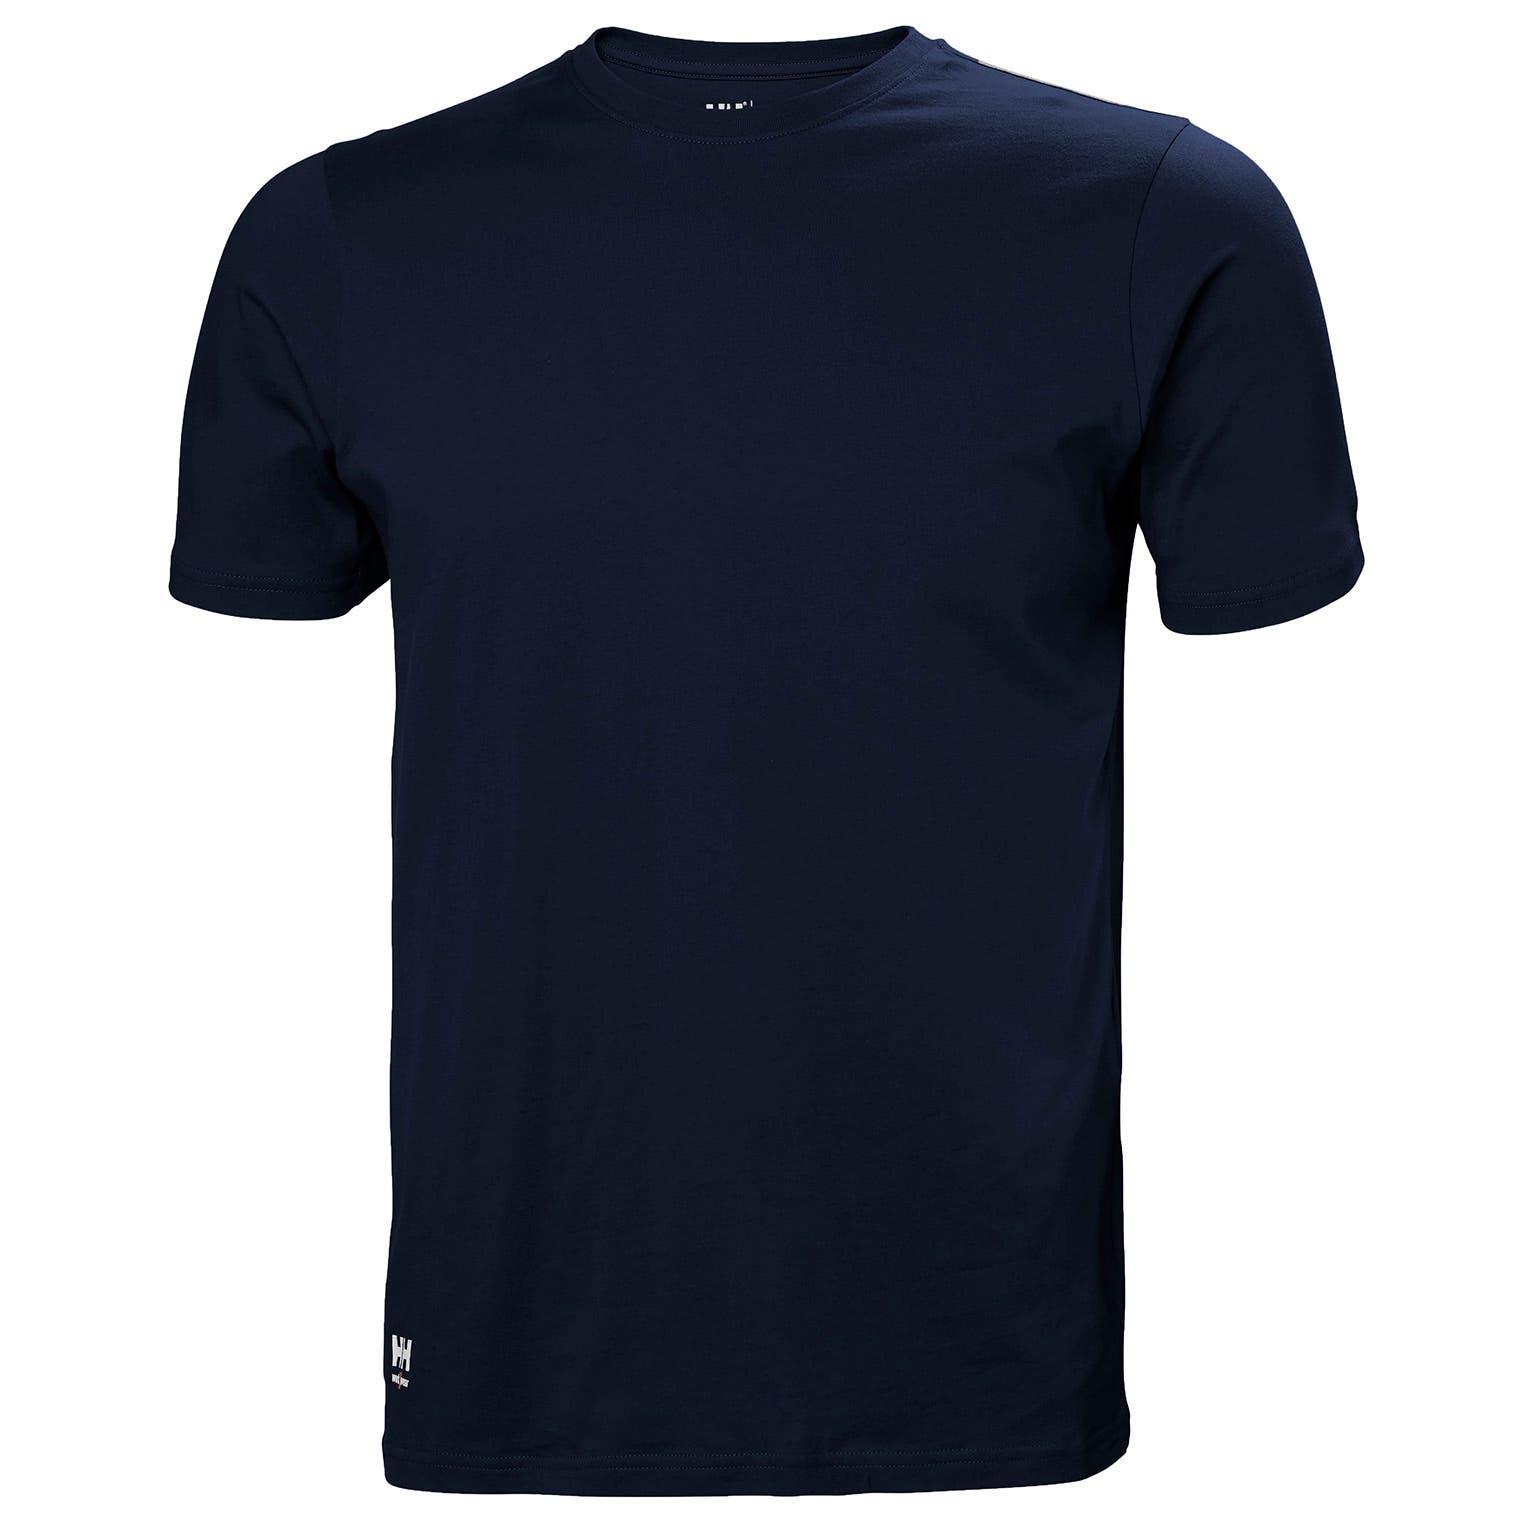 Футболка Helly Hansen Manchester T-Shirt - 79161 (Navy; L)